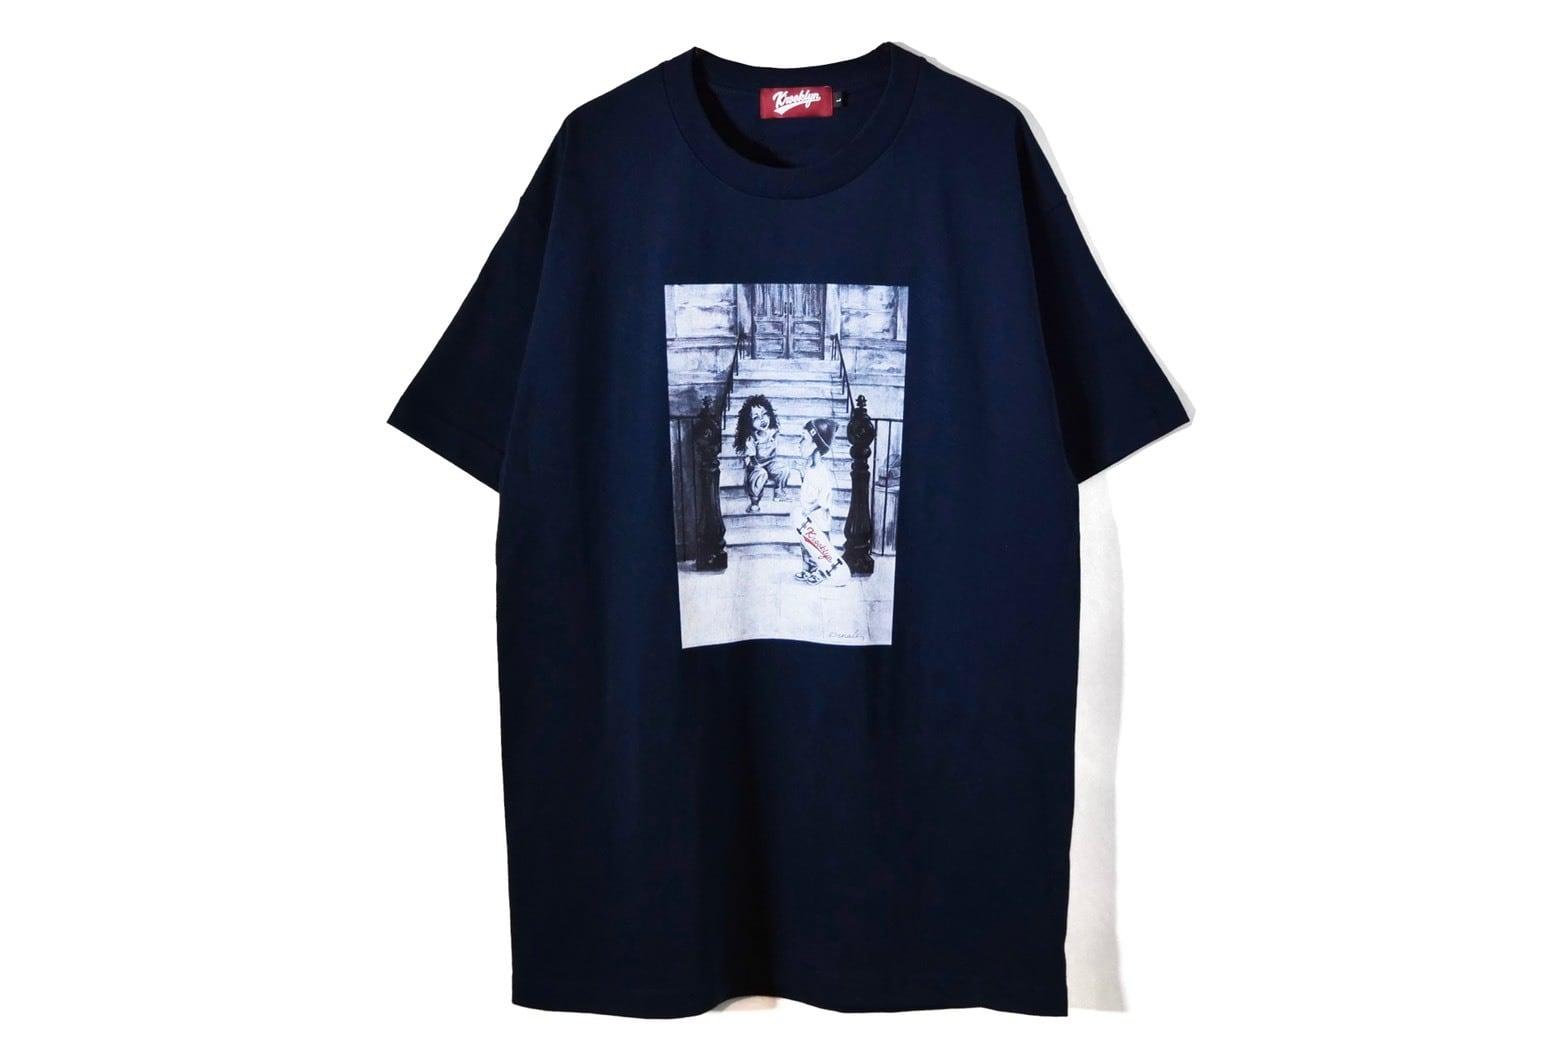 K'rooklyn × Denali  T-Shirts - Navy